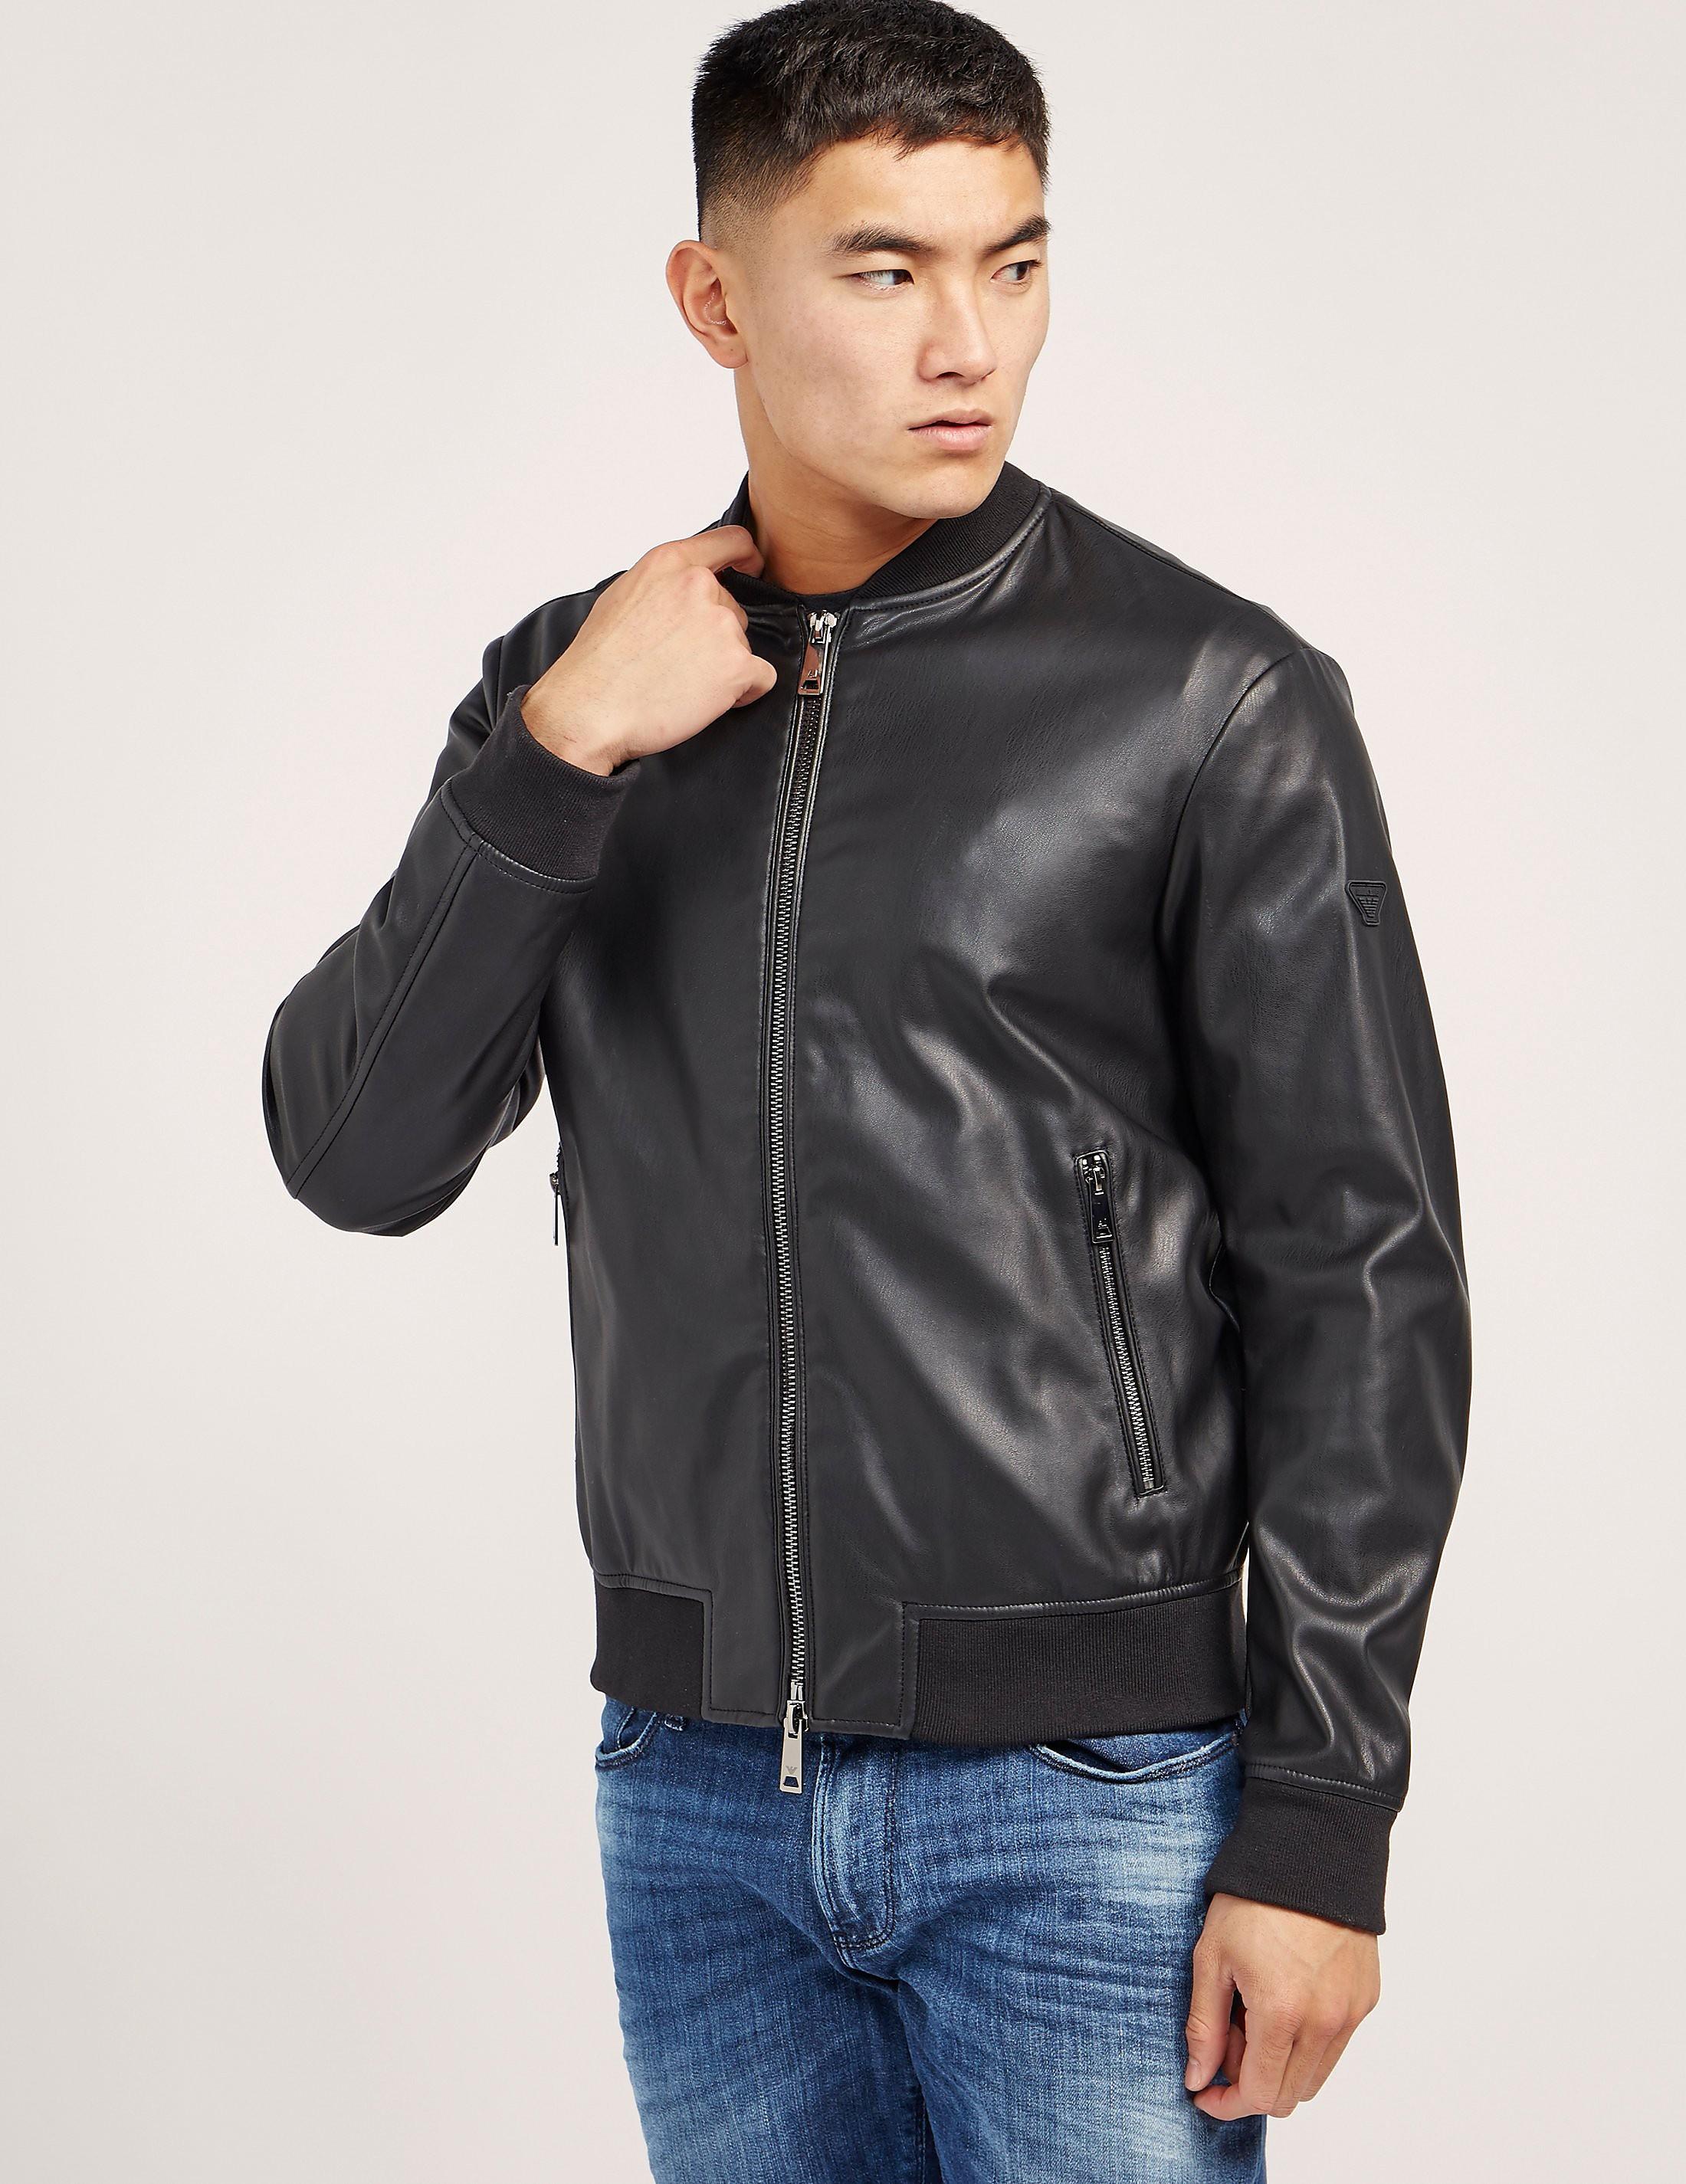 Armani Jeans Faux Leather Bomber Jacket